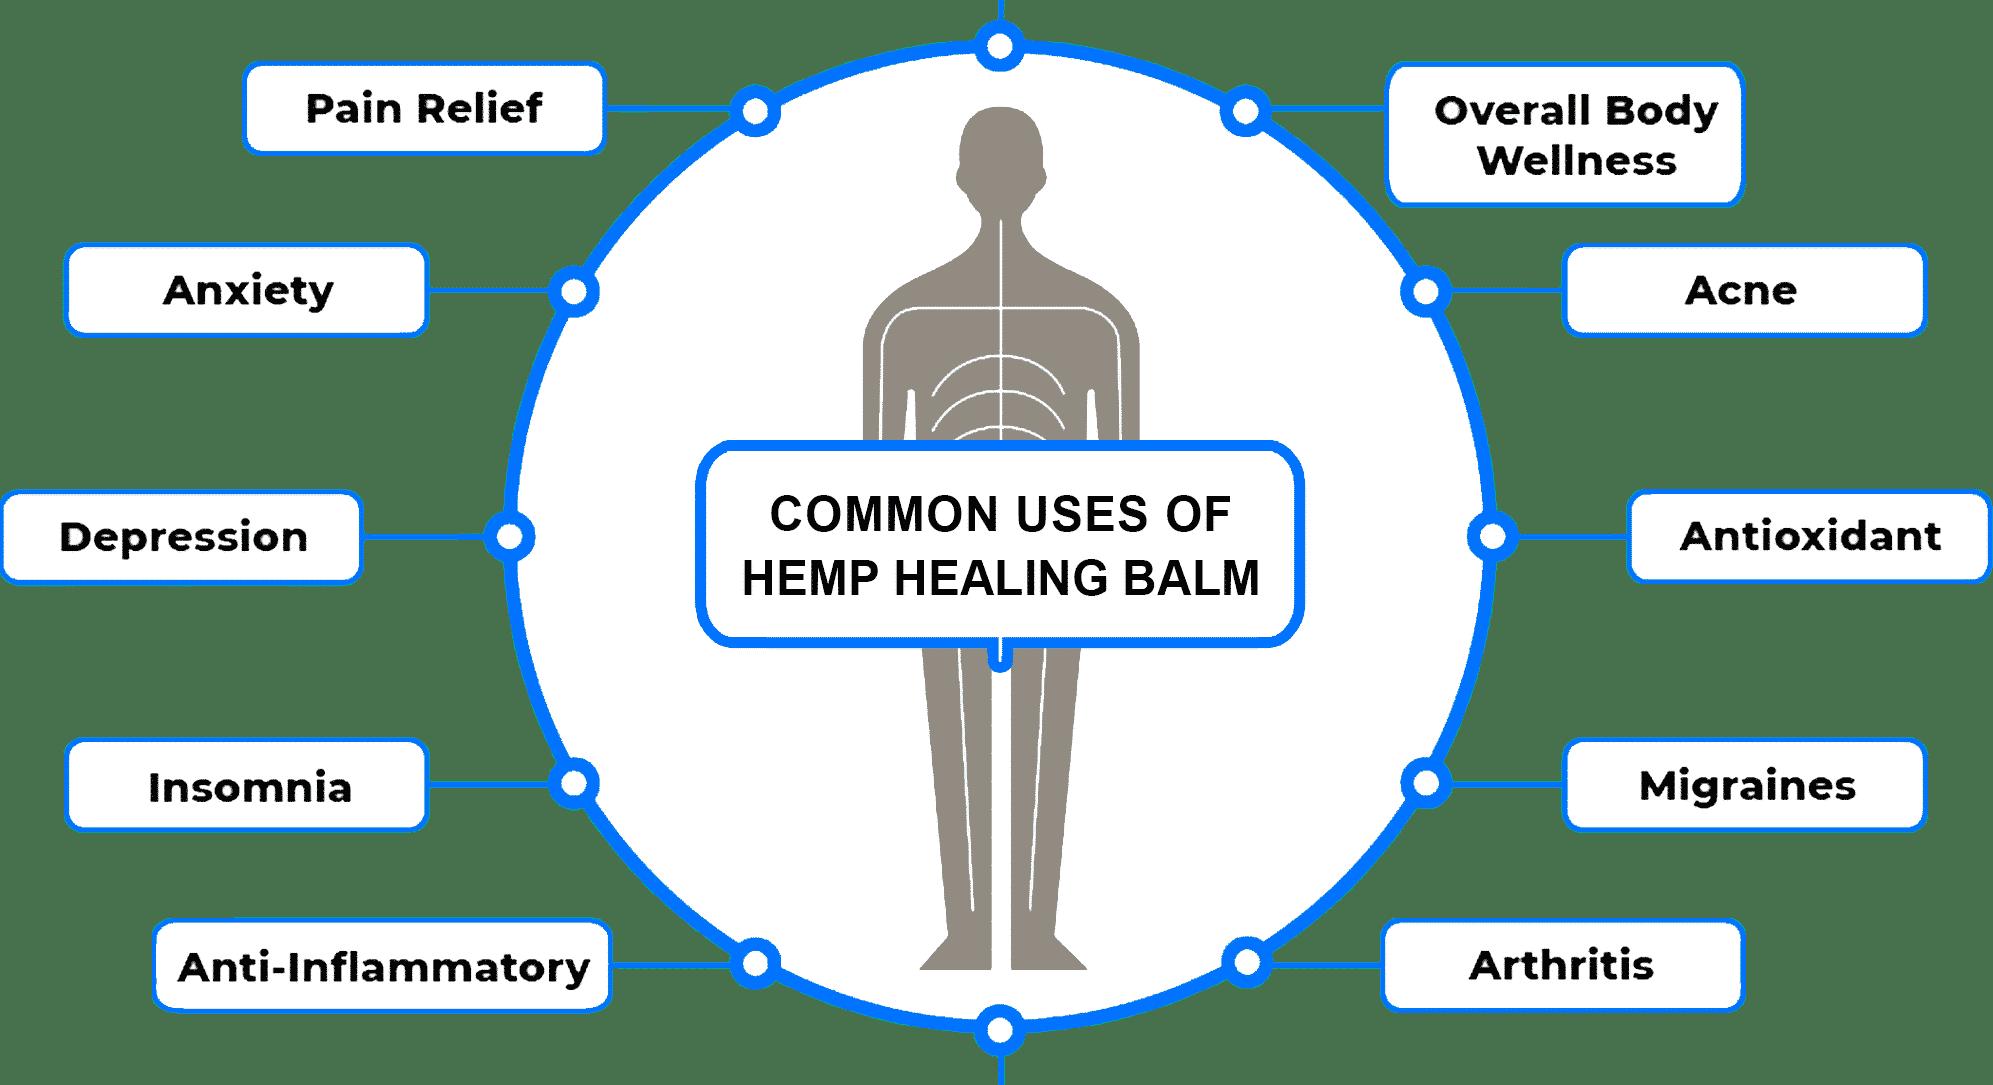 COMMON USES OF HEMP HEALING BALM